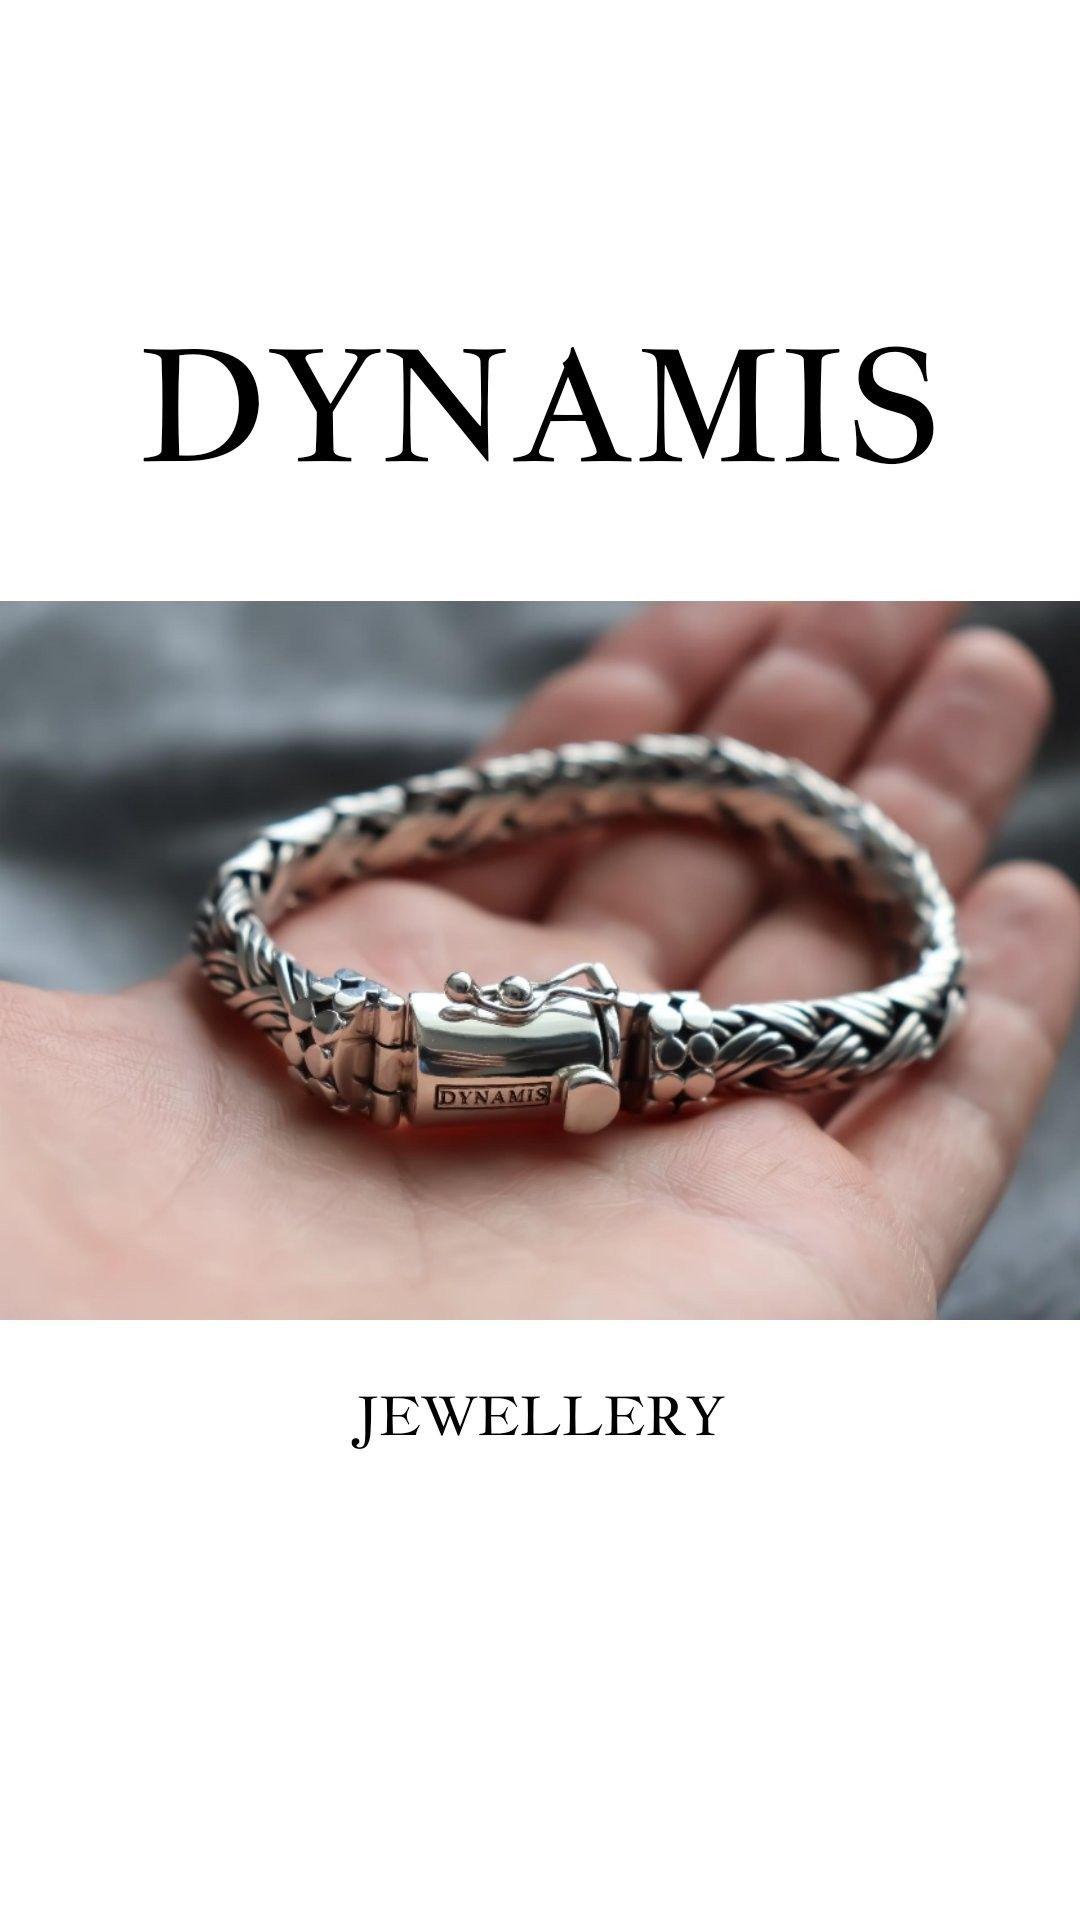 filigree Bridesmaid gift idea 925 silver bracelet twisted wire bracelet braid bracelet